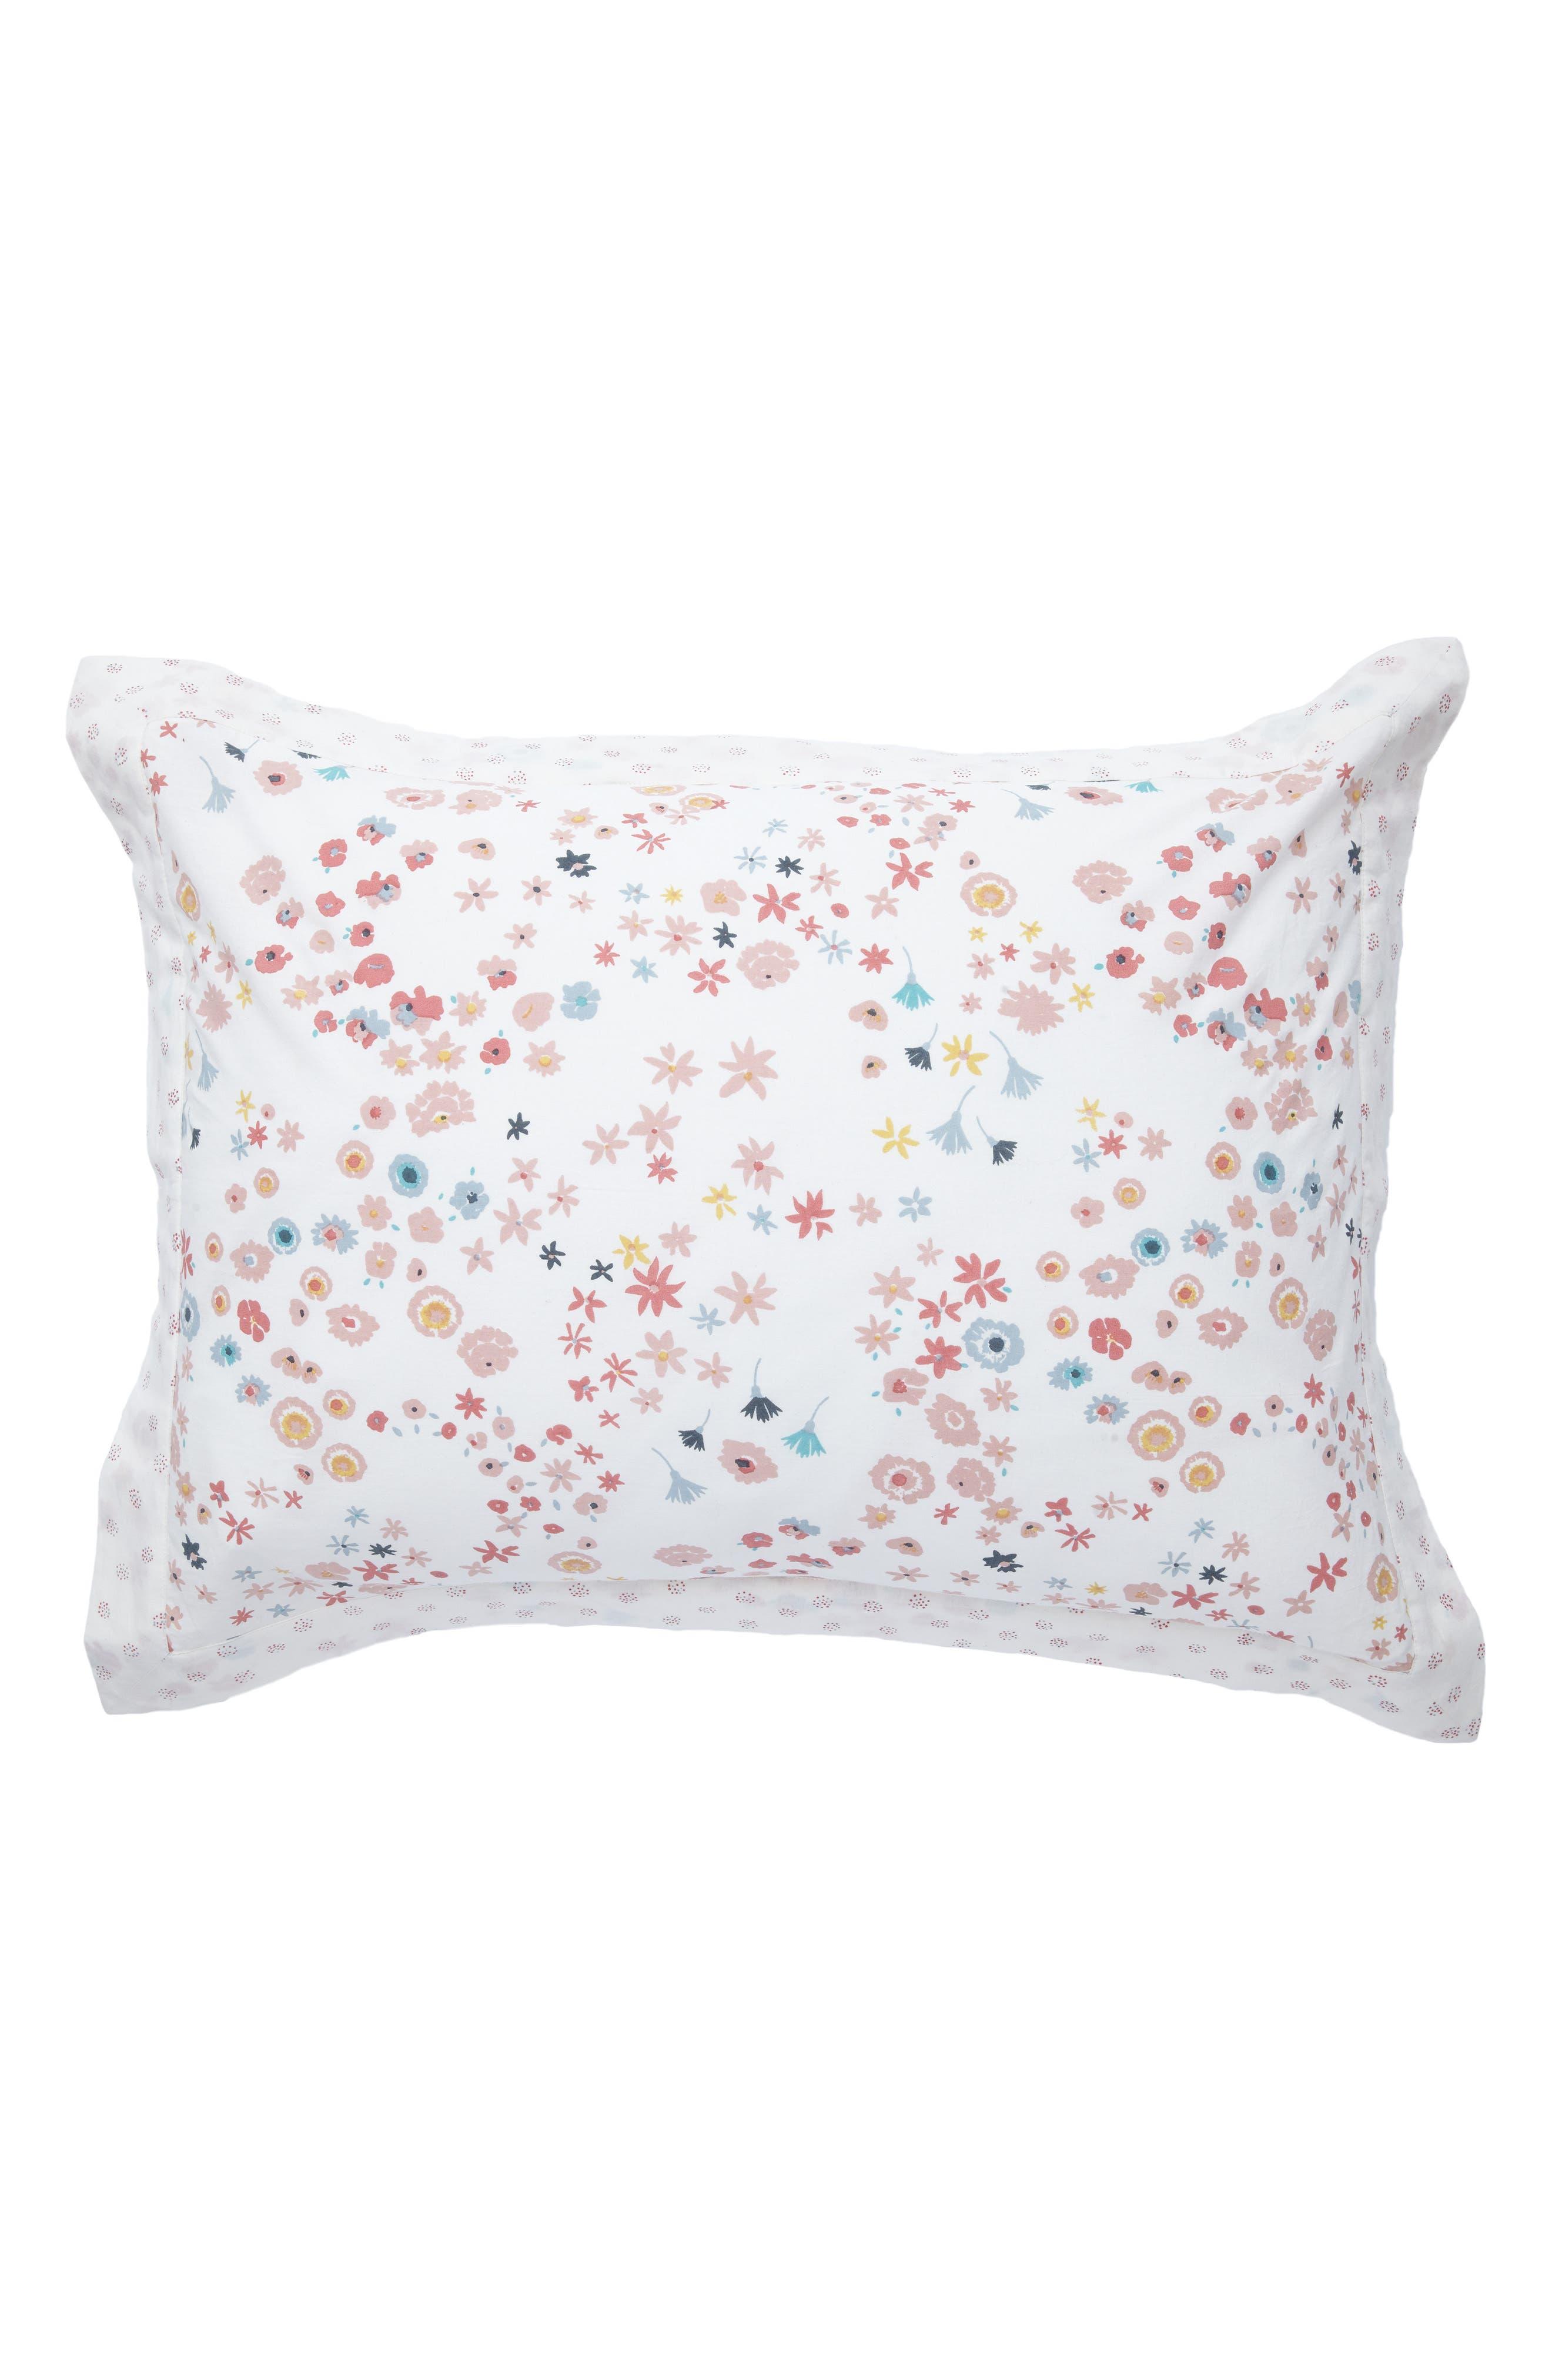 Reversible Standard Pillow Sham,                         Main,                         color, PINK